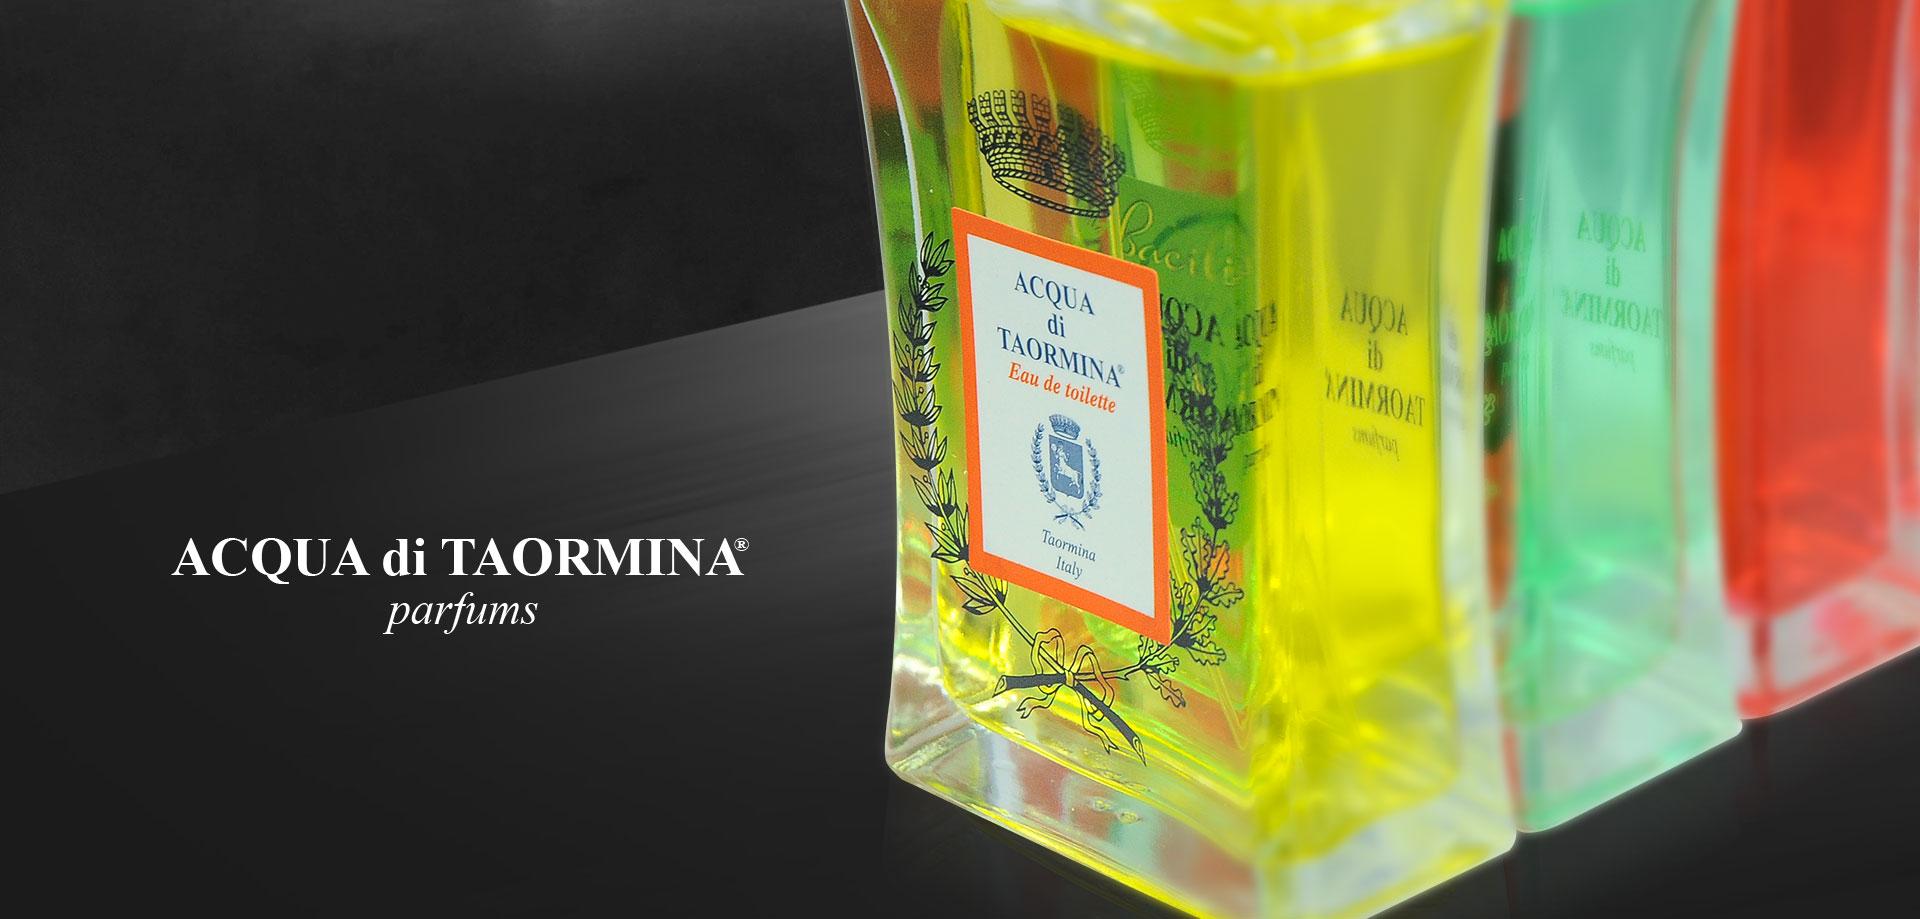 Acqua di Taormina parfums parfumsblack Chi Siamo